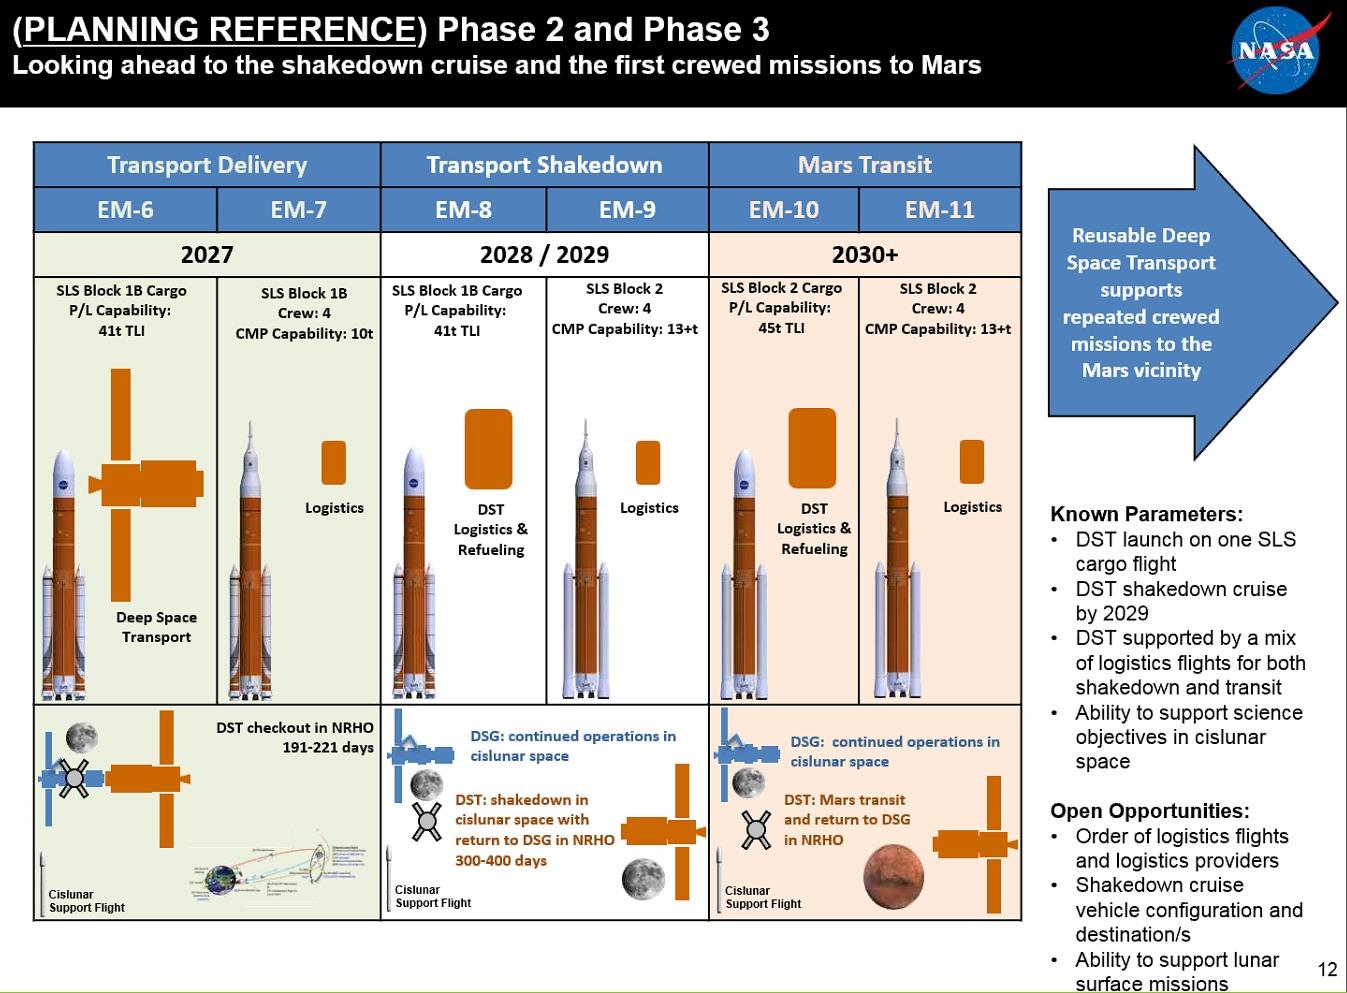 http://www.spaceflightinsider.com/wp-content/uploads/2017/03/Gerst5.jpg